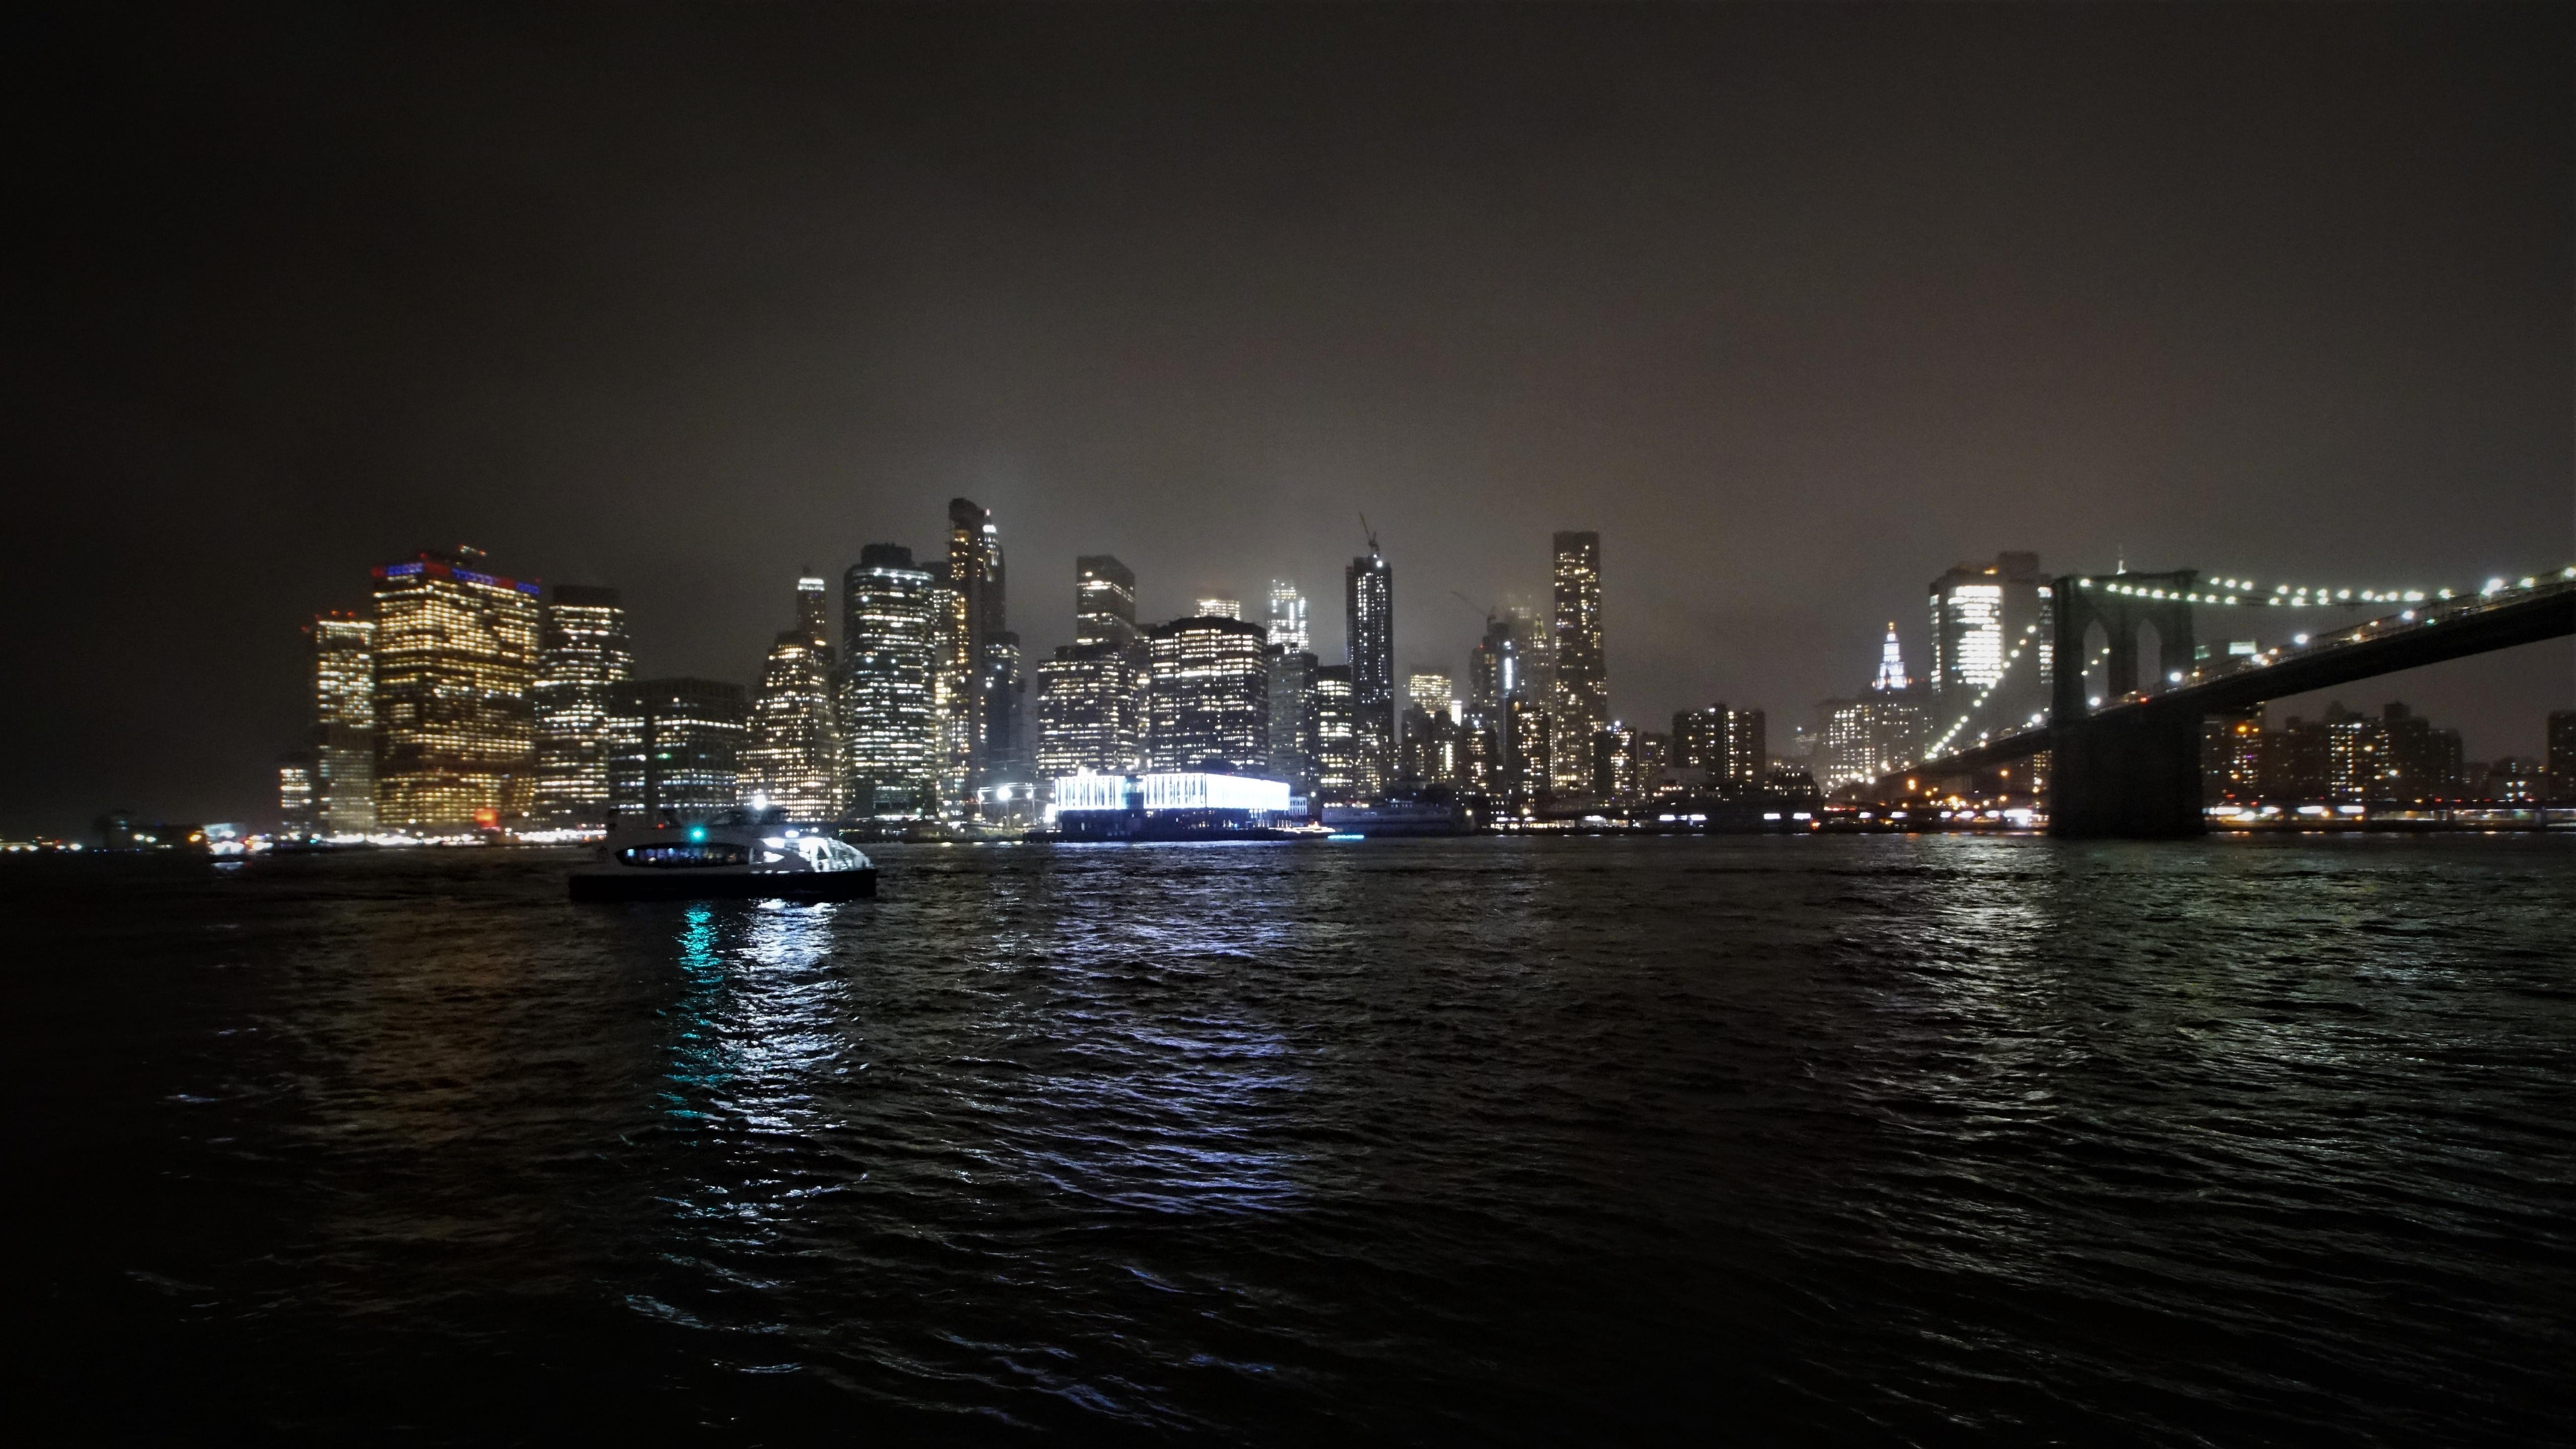 Stadt bei Nacht wallpaper